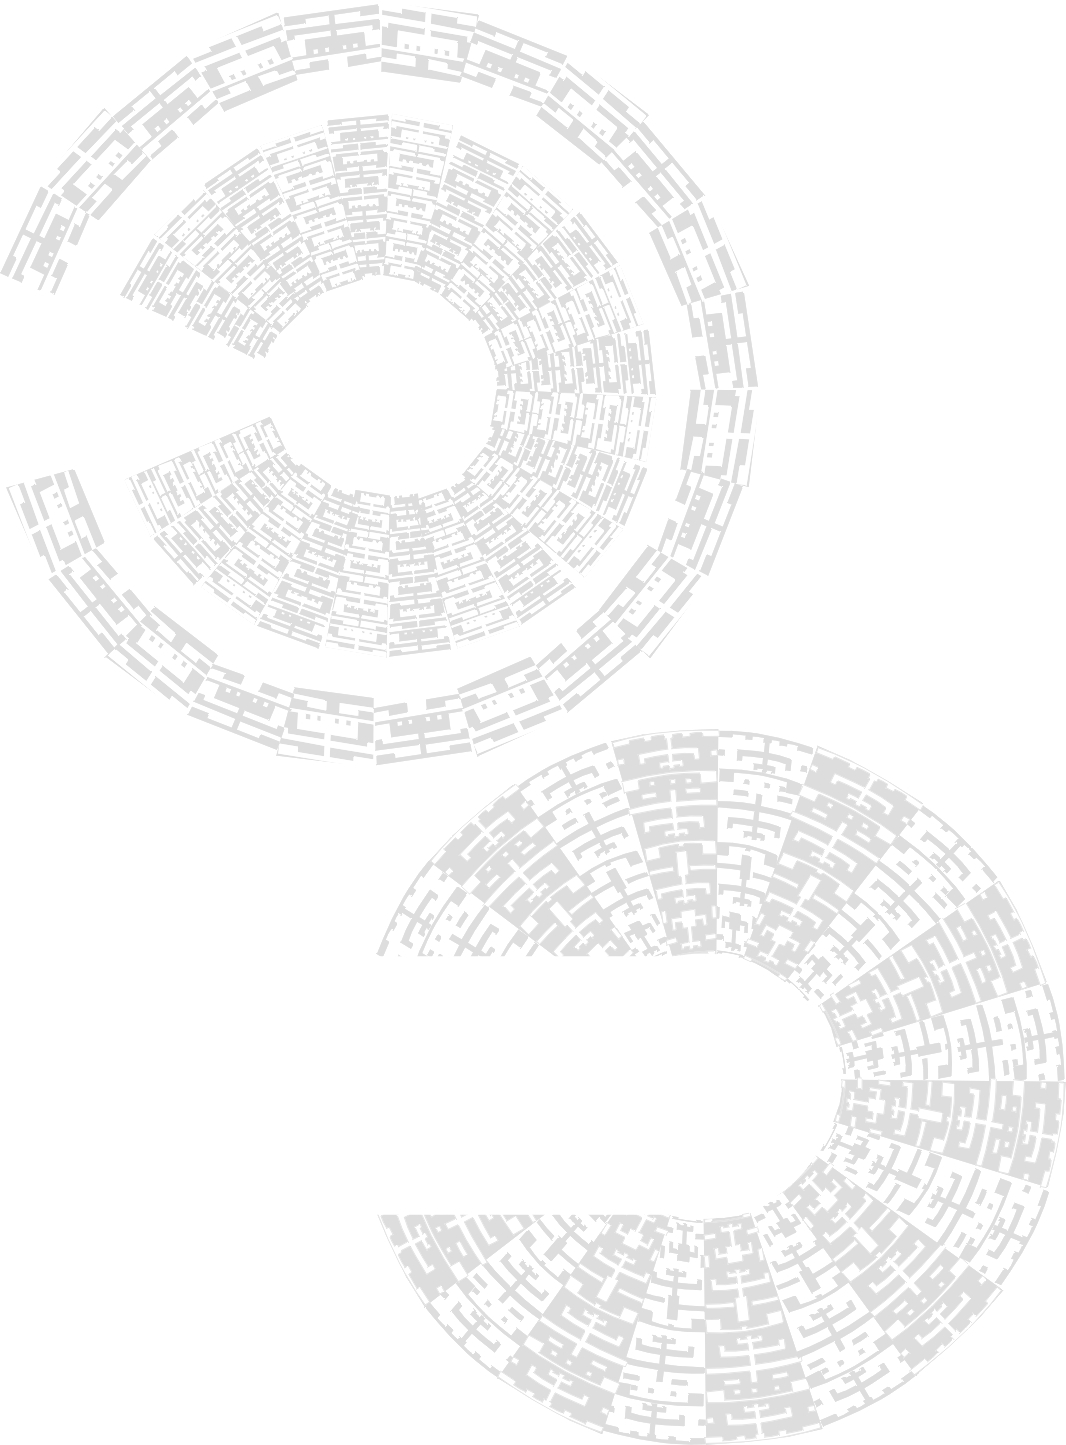 Free Window Decal Vector Graphic as well Star Trek Uss Enterprise Nx1 Aztec Decals For Pll 1 350 Acreation Models additionally Vinyls Star Warsstar Trek likewise Starshipmodeler as well C10987. on star trek enterprise decals